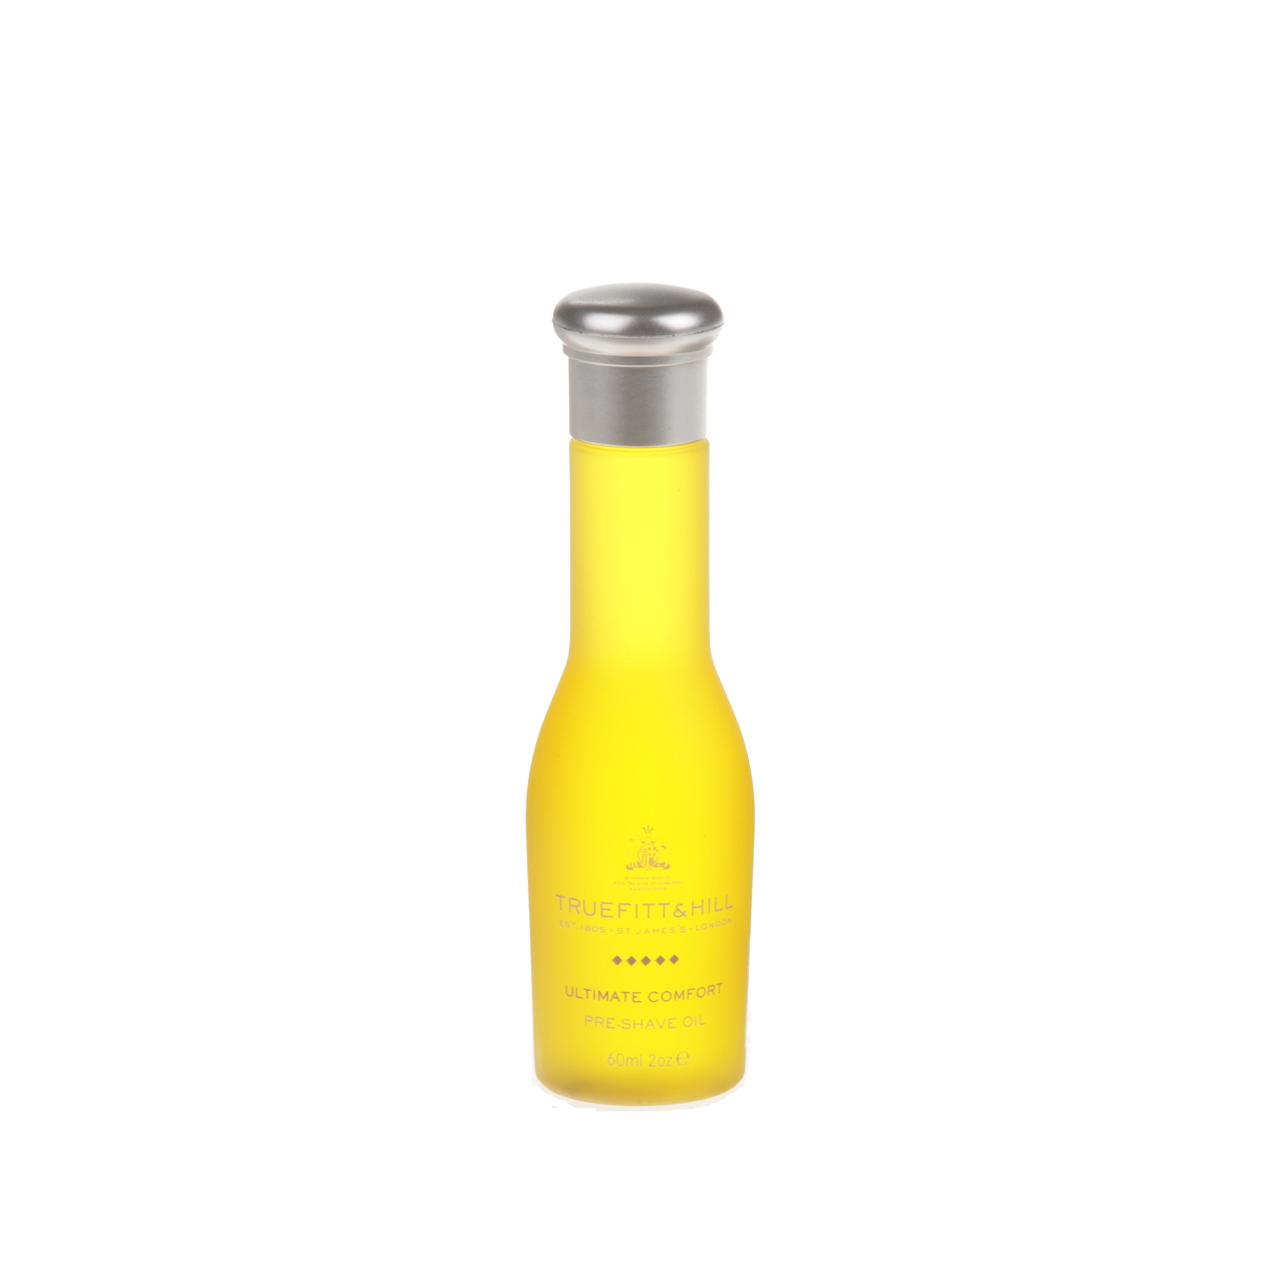 Ultimate Comfort - Pre Shave Oil